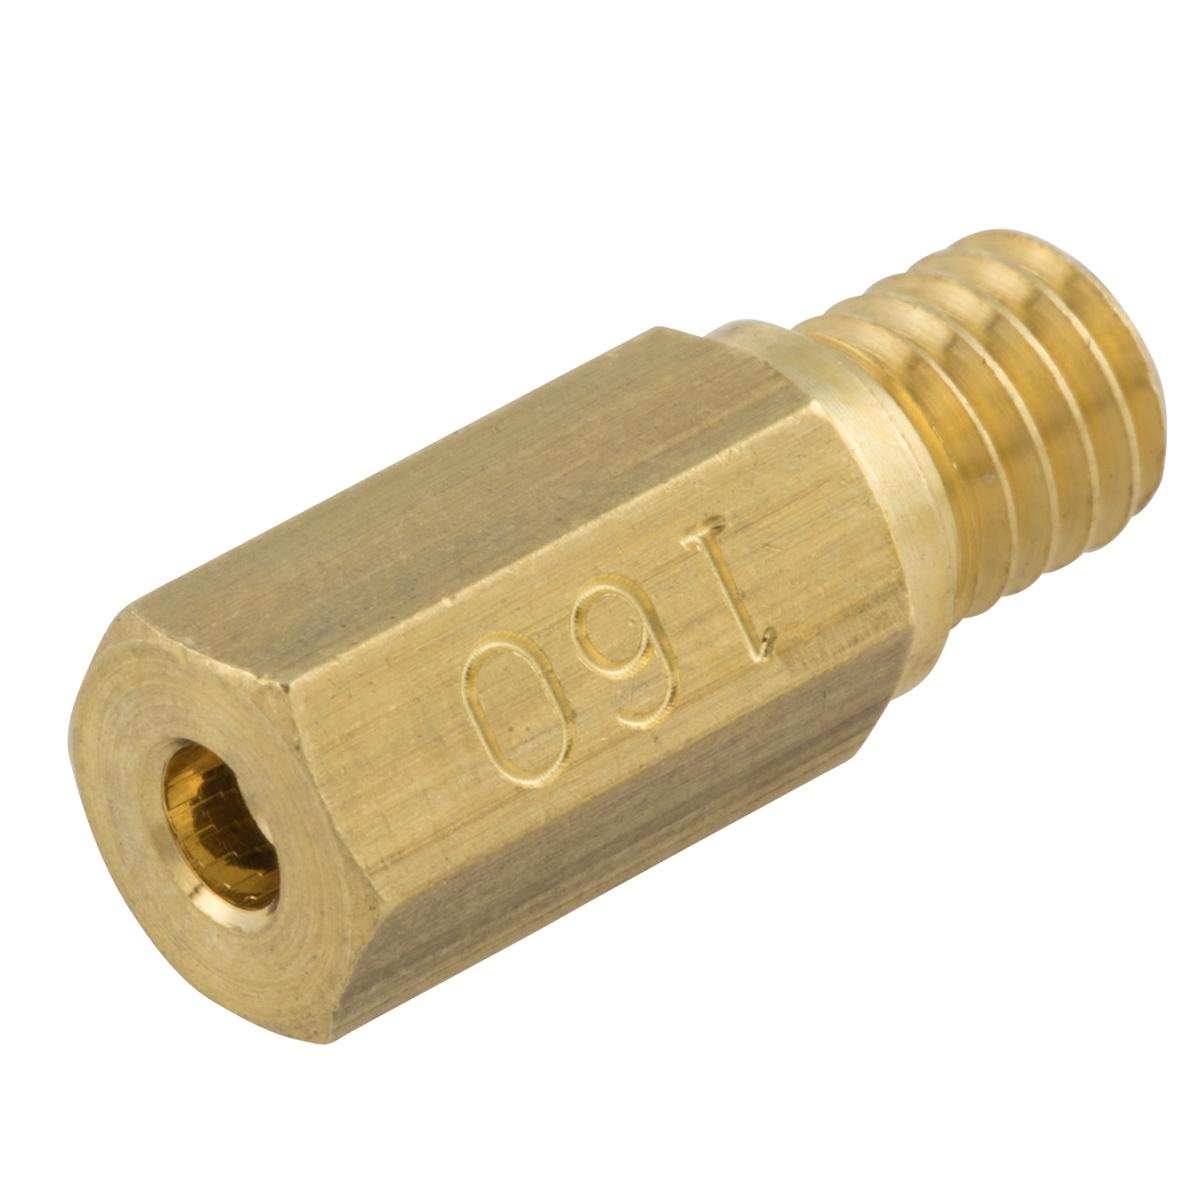 Produktbild für 'Düse KMT 132 Ø 6 mm'